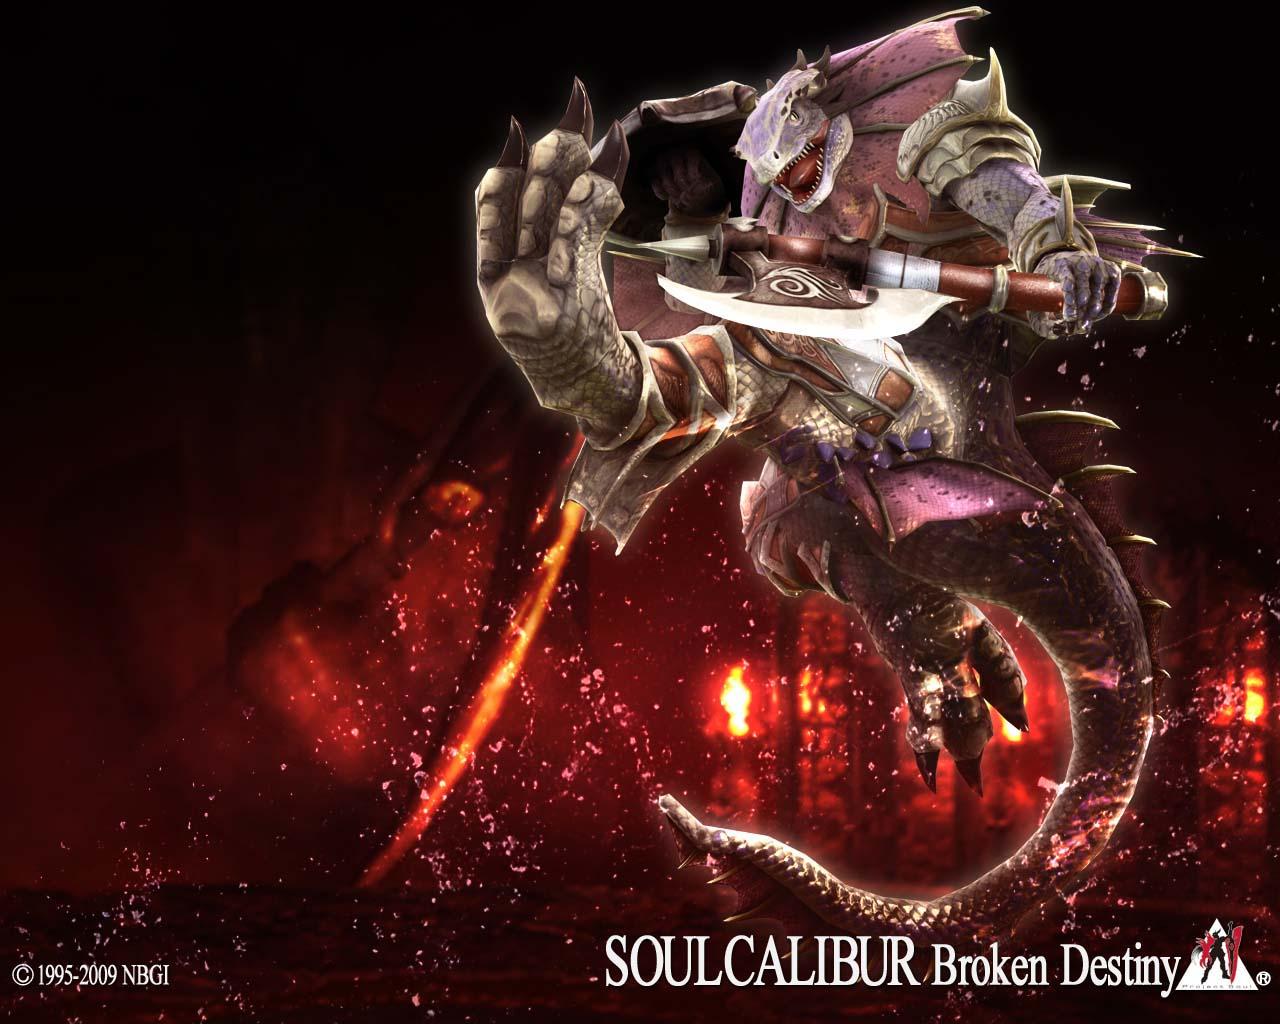 Image soul calibur broken destiny lizardman wallpaper - Soul calibur wallpaper ...